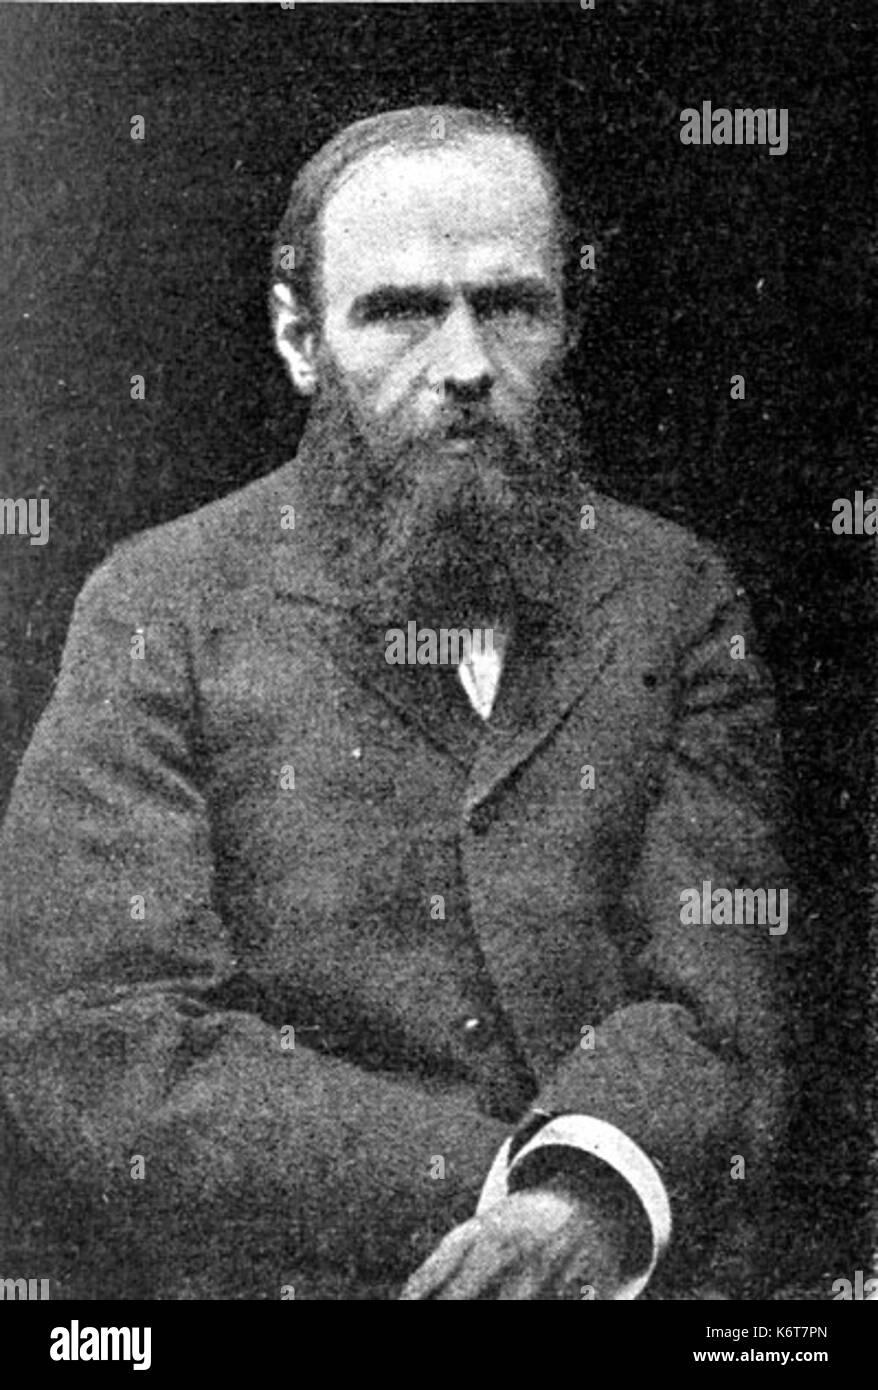 Fjodor Michailowitsch Dostojewski - Stock Image